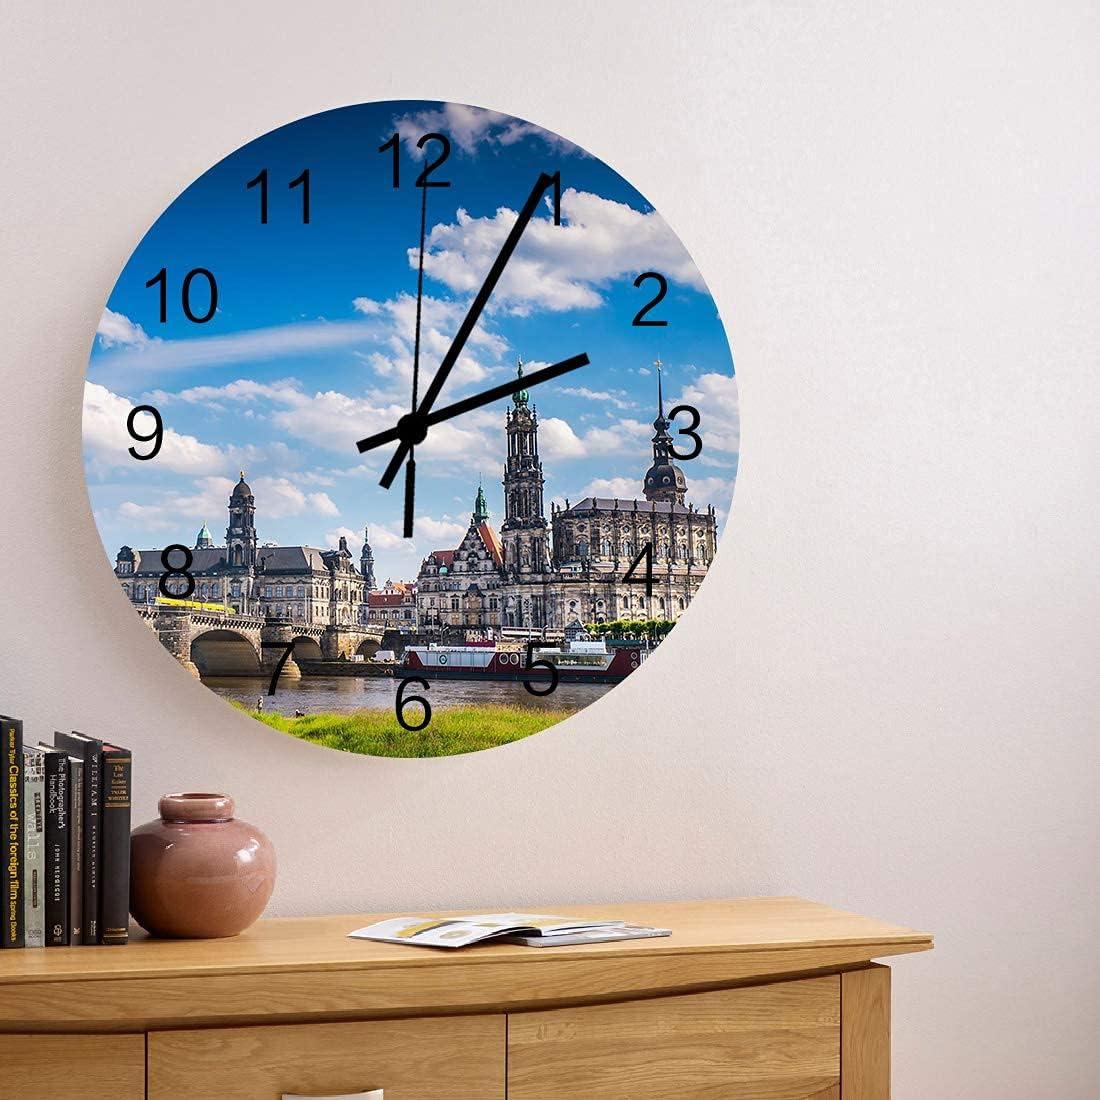 Reloj de pared de madera redondo silencioso sin tictac de 10 pulgadas, casco antiguo de Ston de Alemania con casa bajo el cielo azul, reloj de manos con números romanos, decoración del hogar para coci